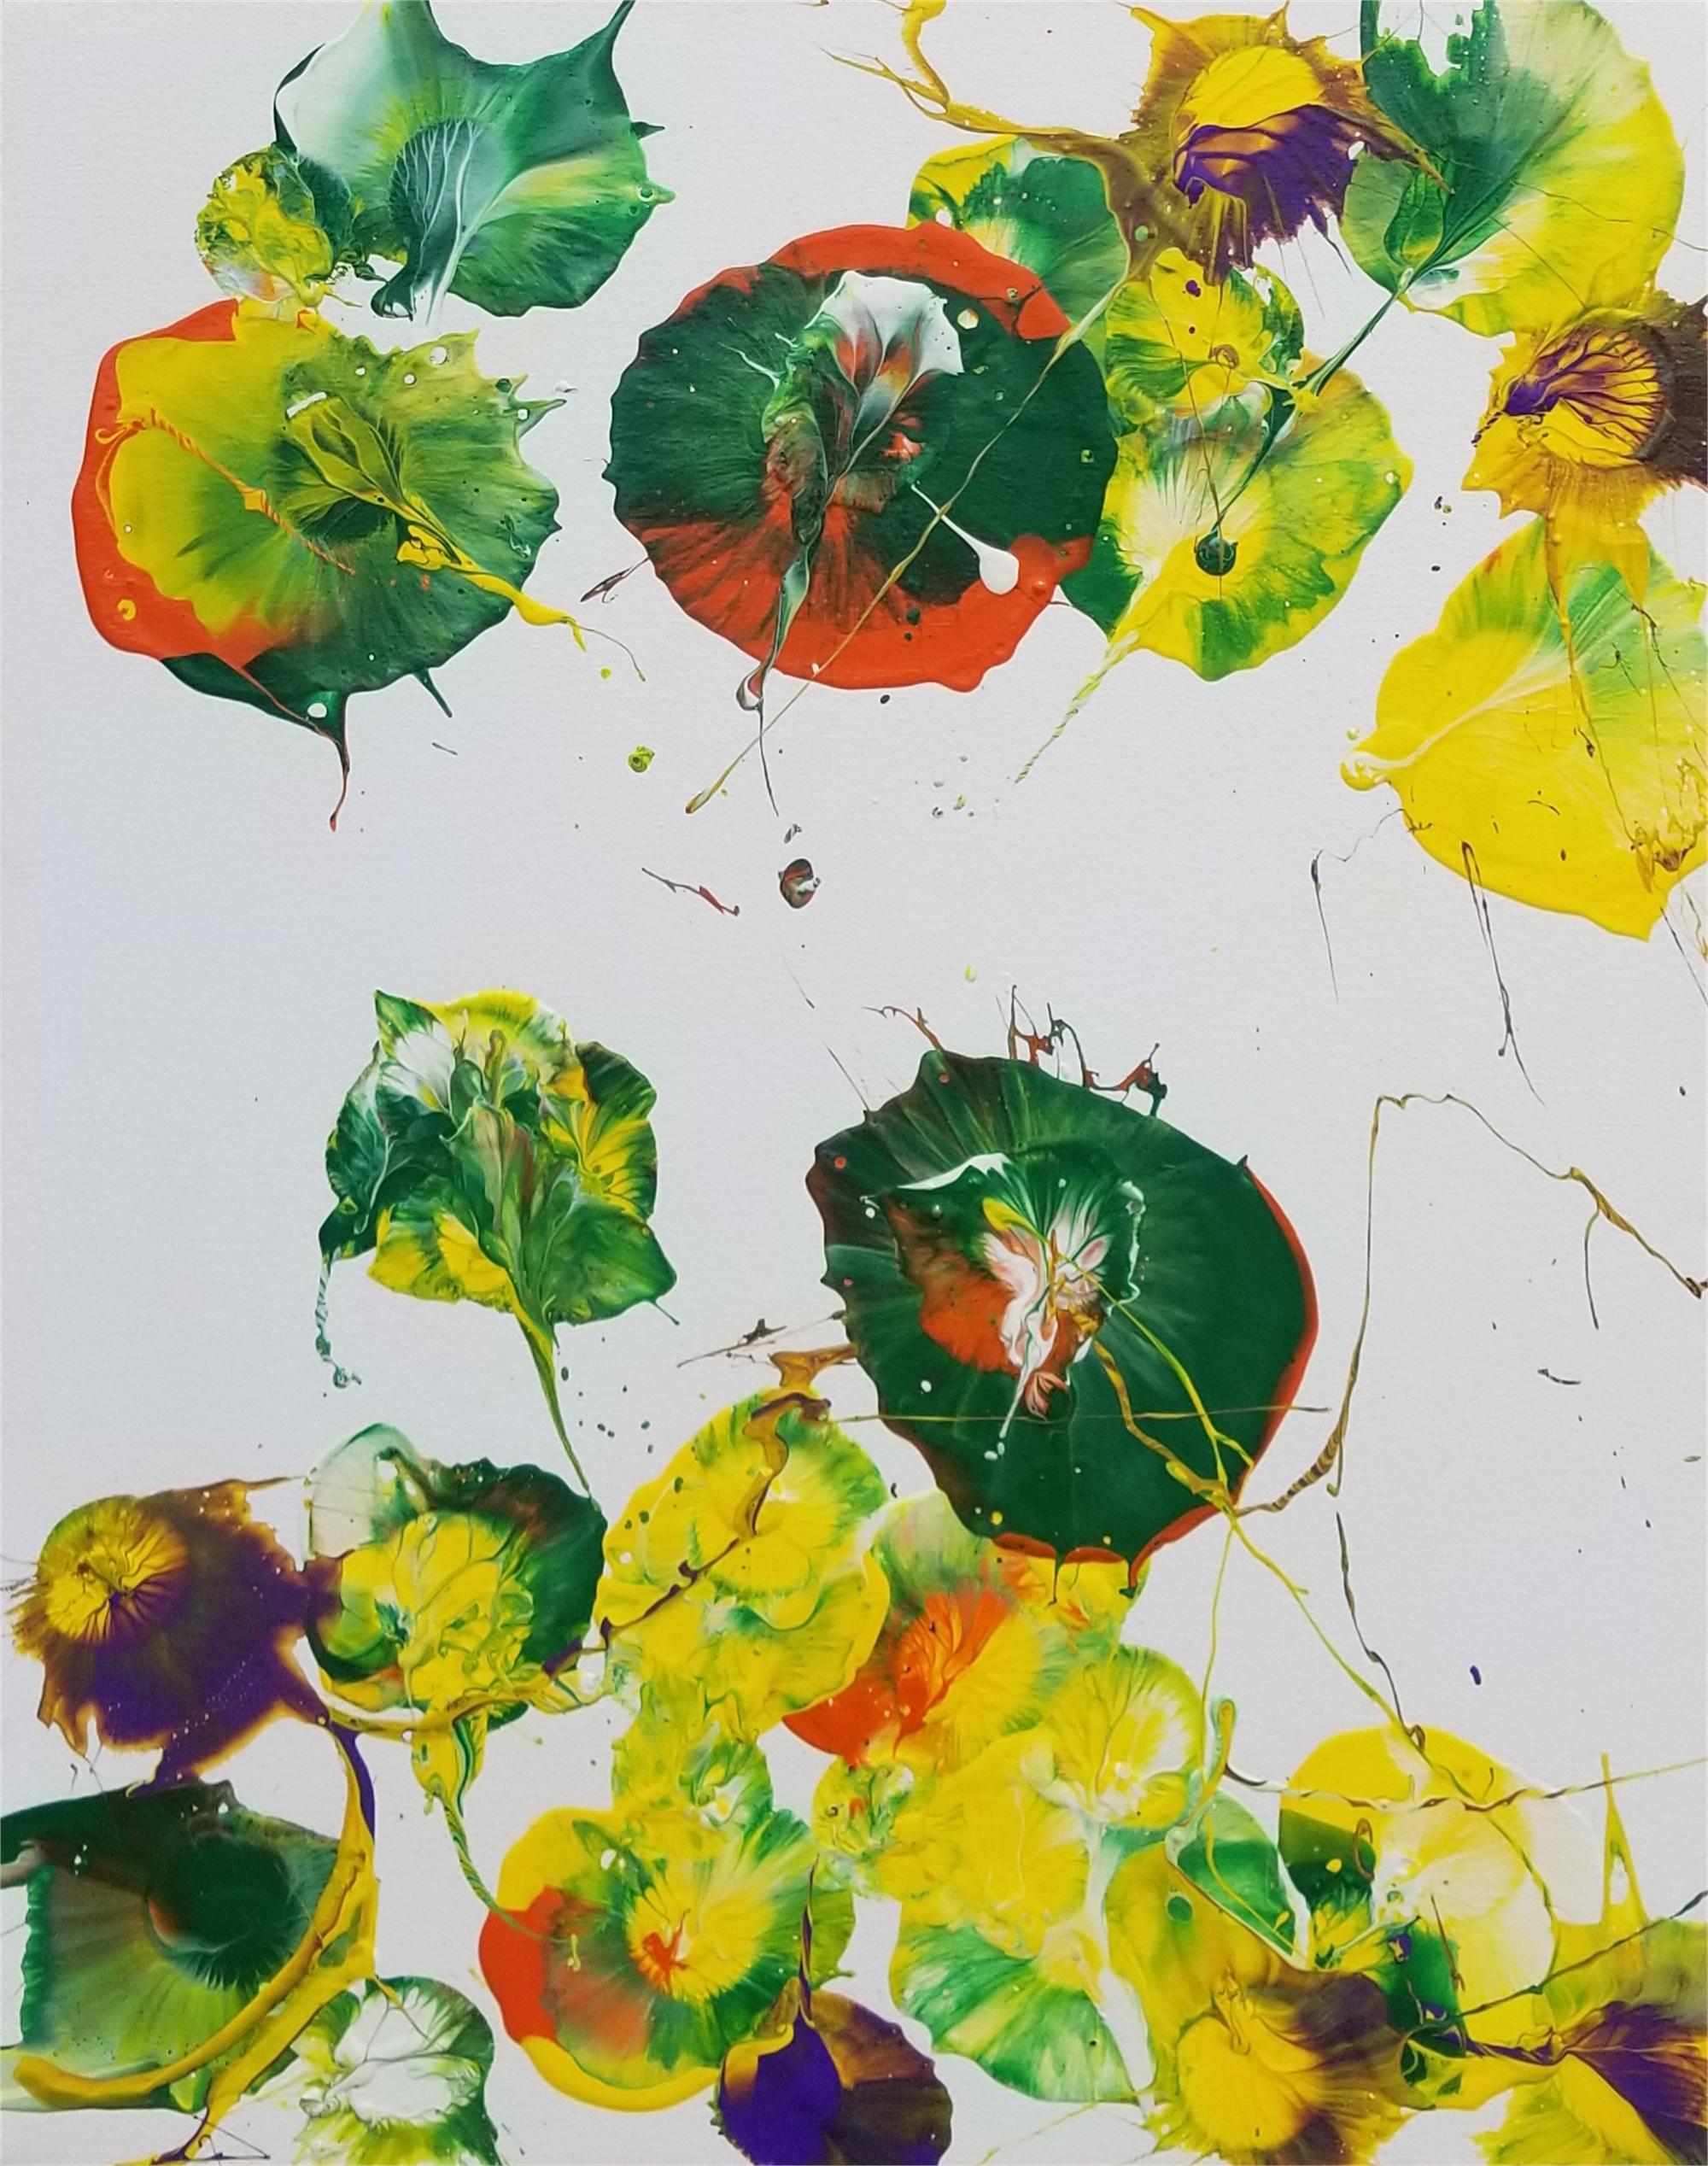 Monet by Cecilia Fransson